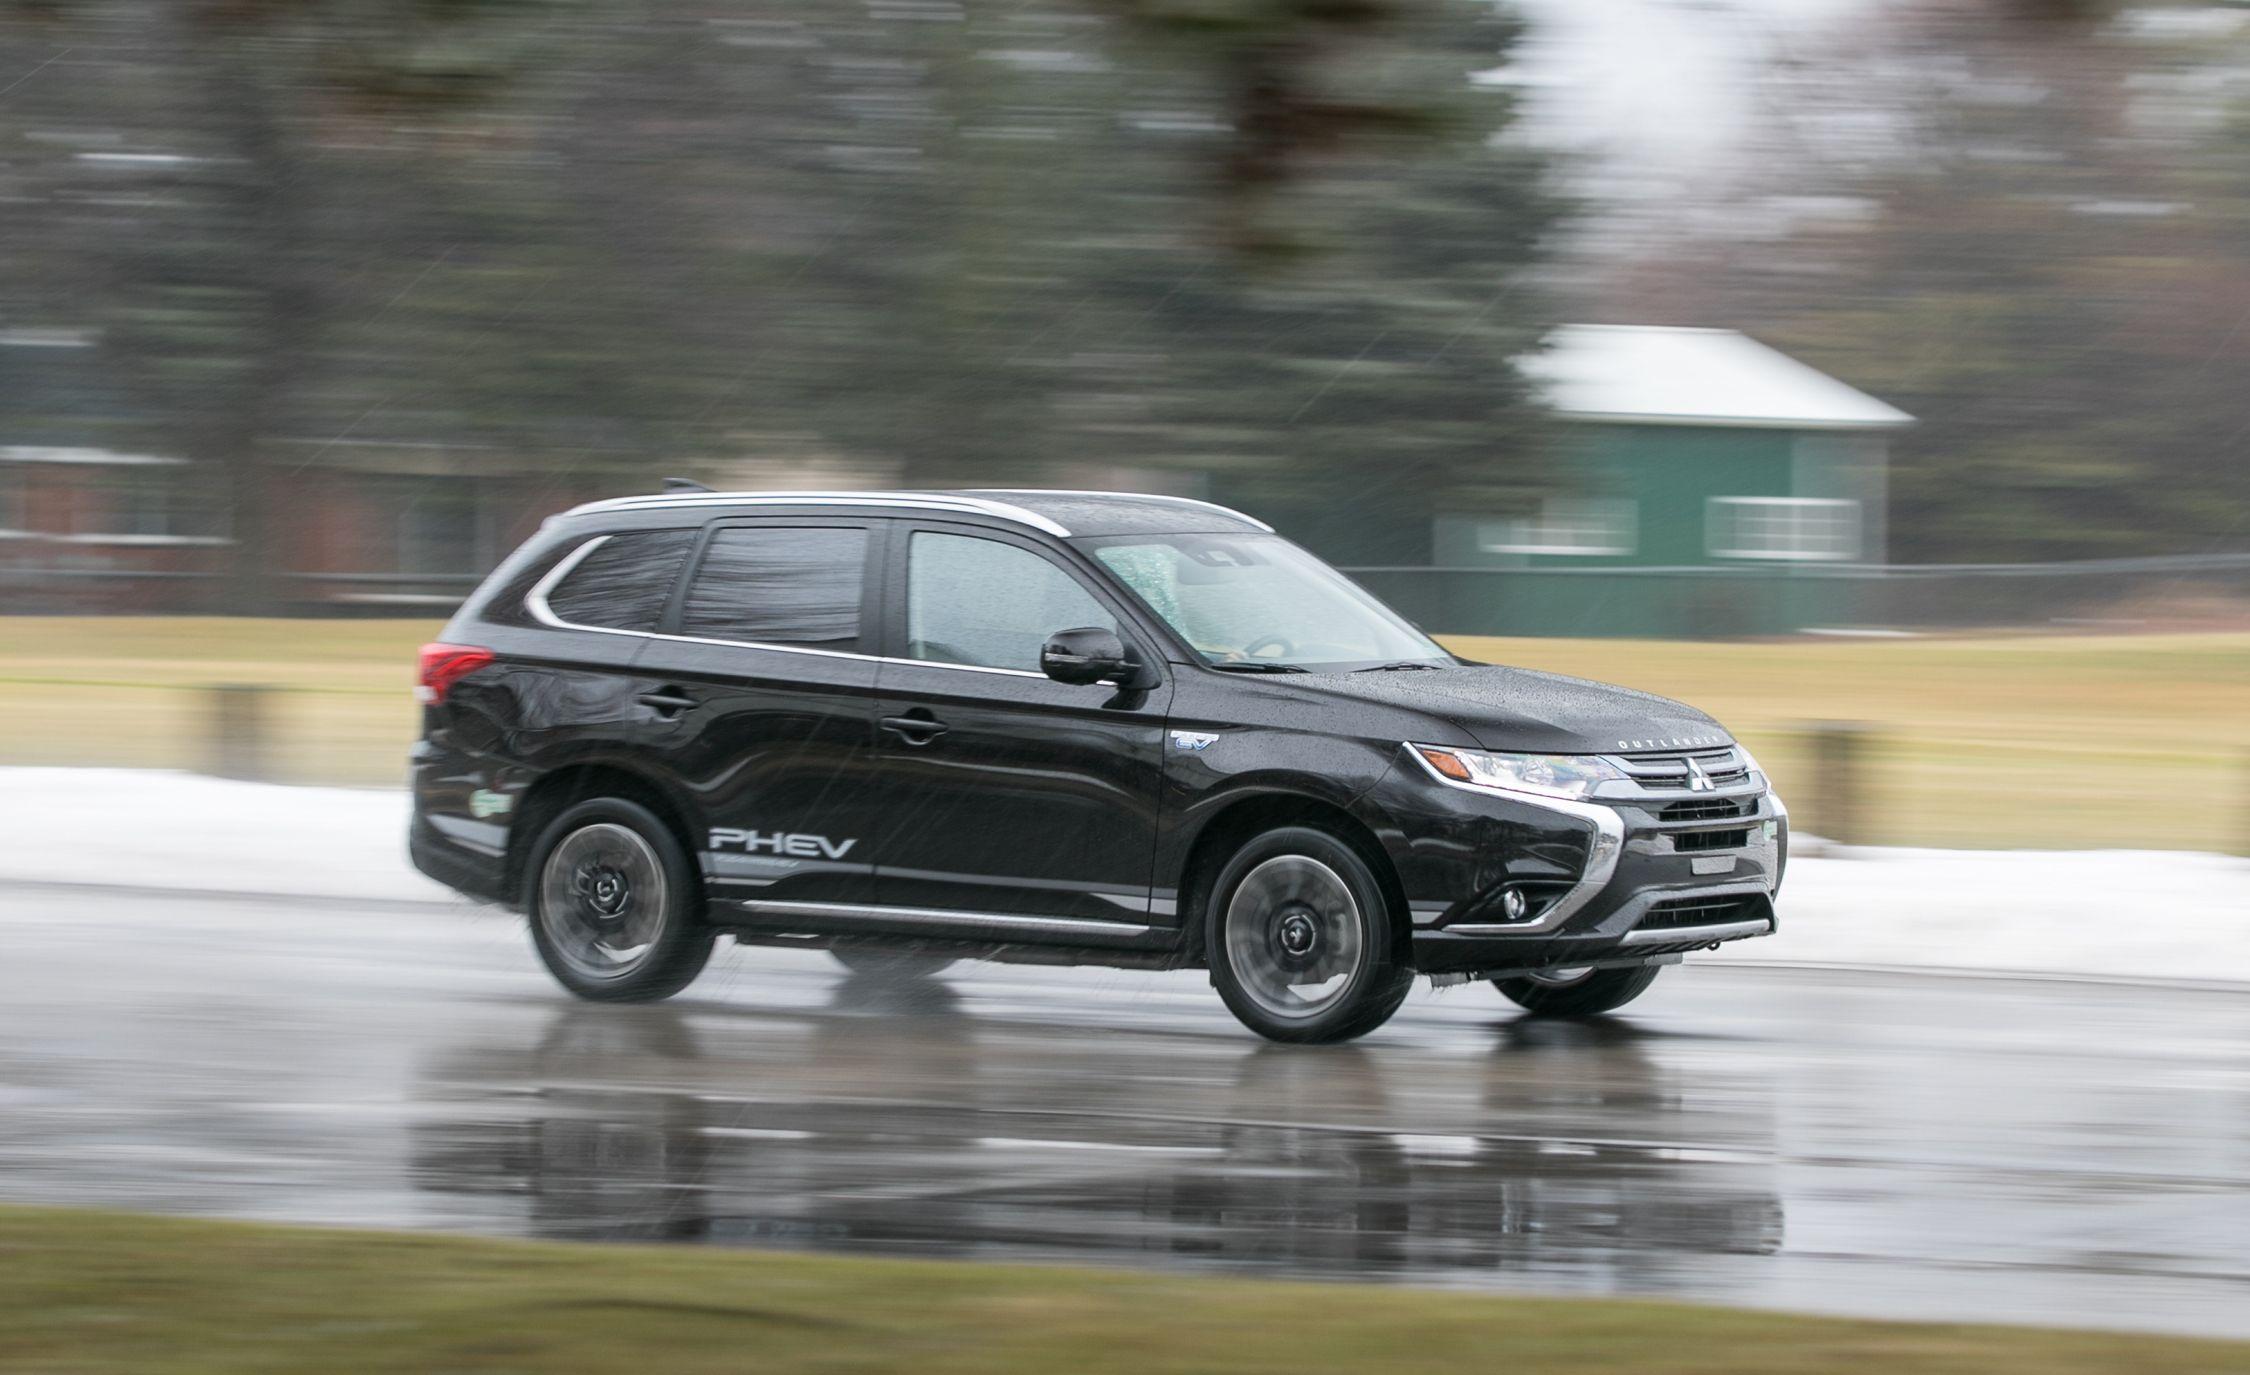 Mitsubishi Outlander Reviews | Mitsubishi Outlander Price, Photos, and  Specs | Car and Driver